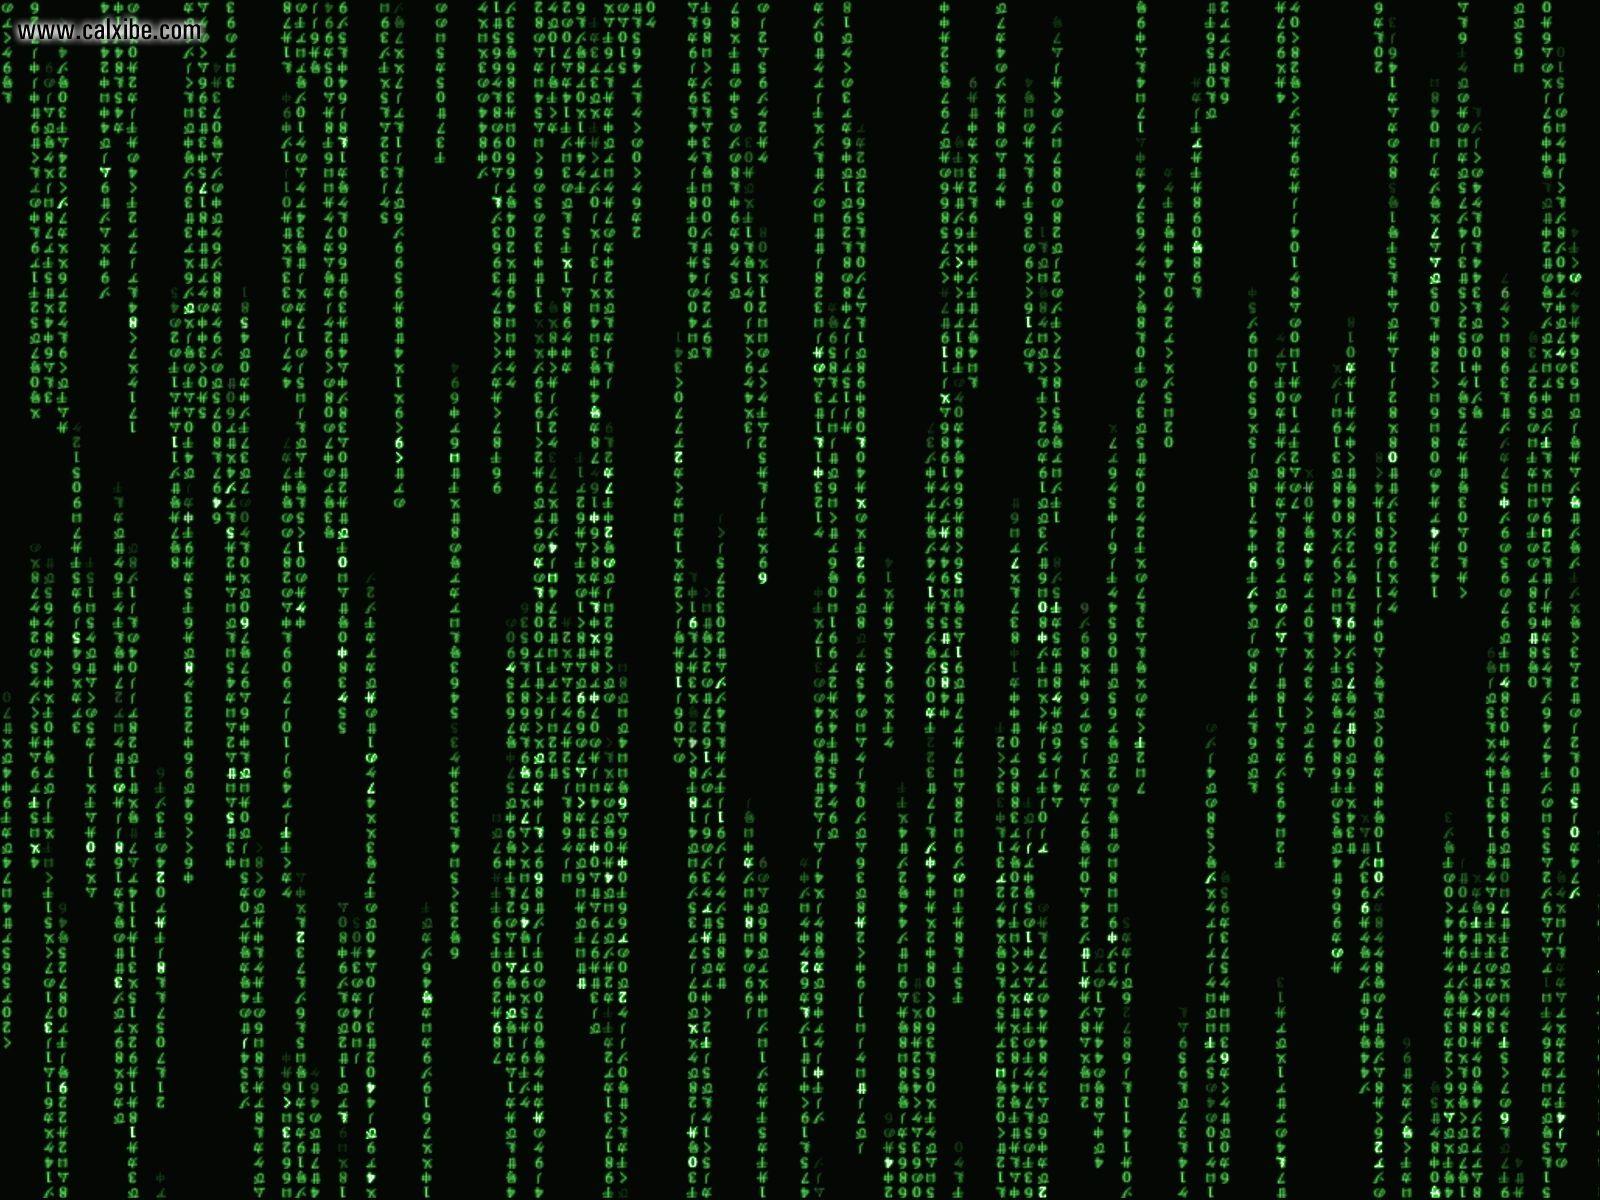 Miscellaneous Matrix Code picture nr 7041 1600x1200